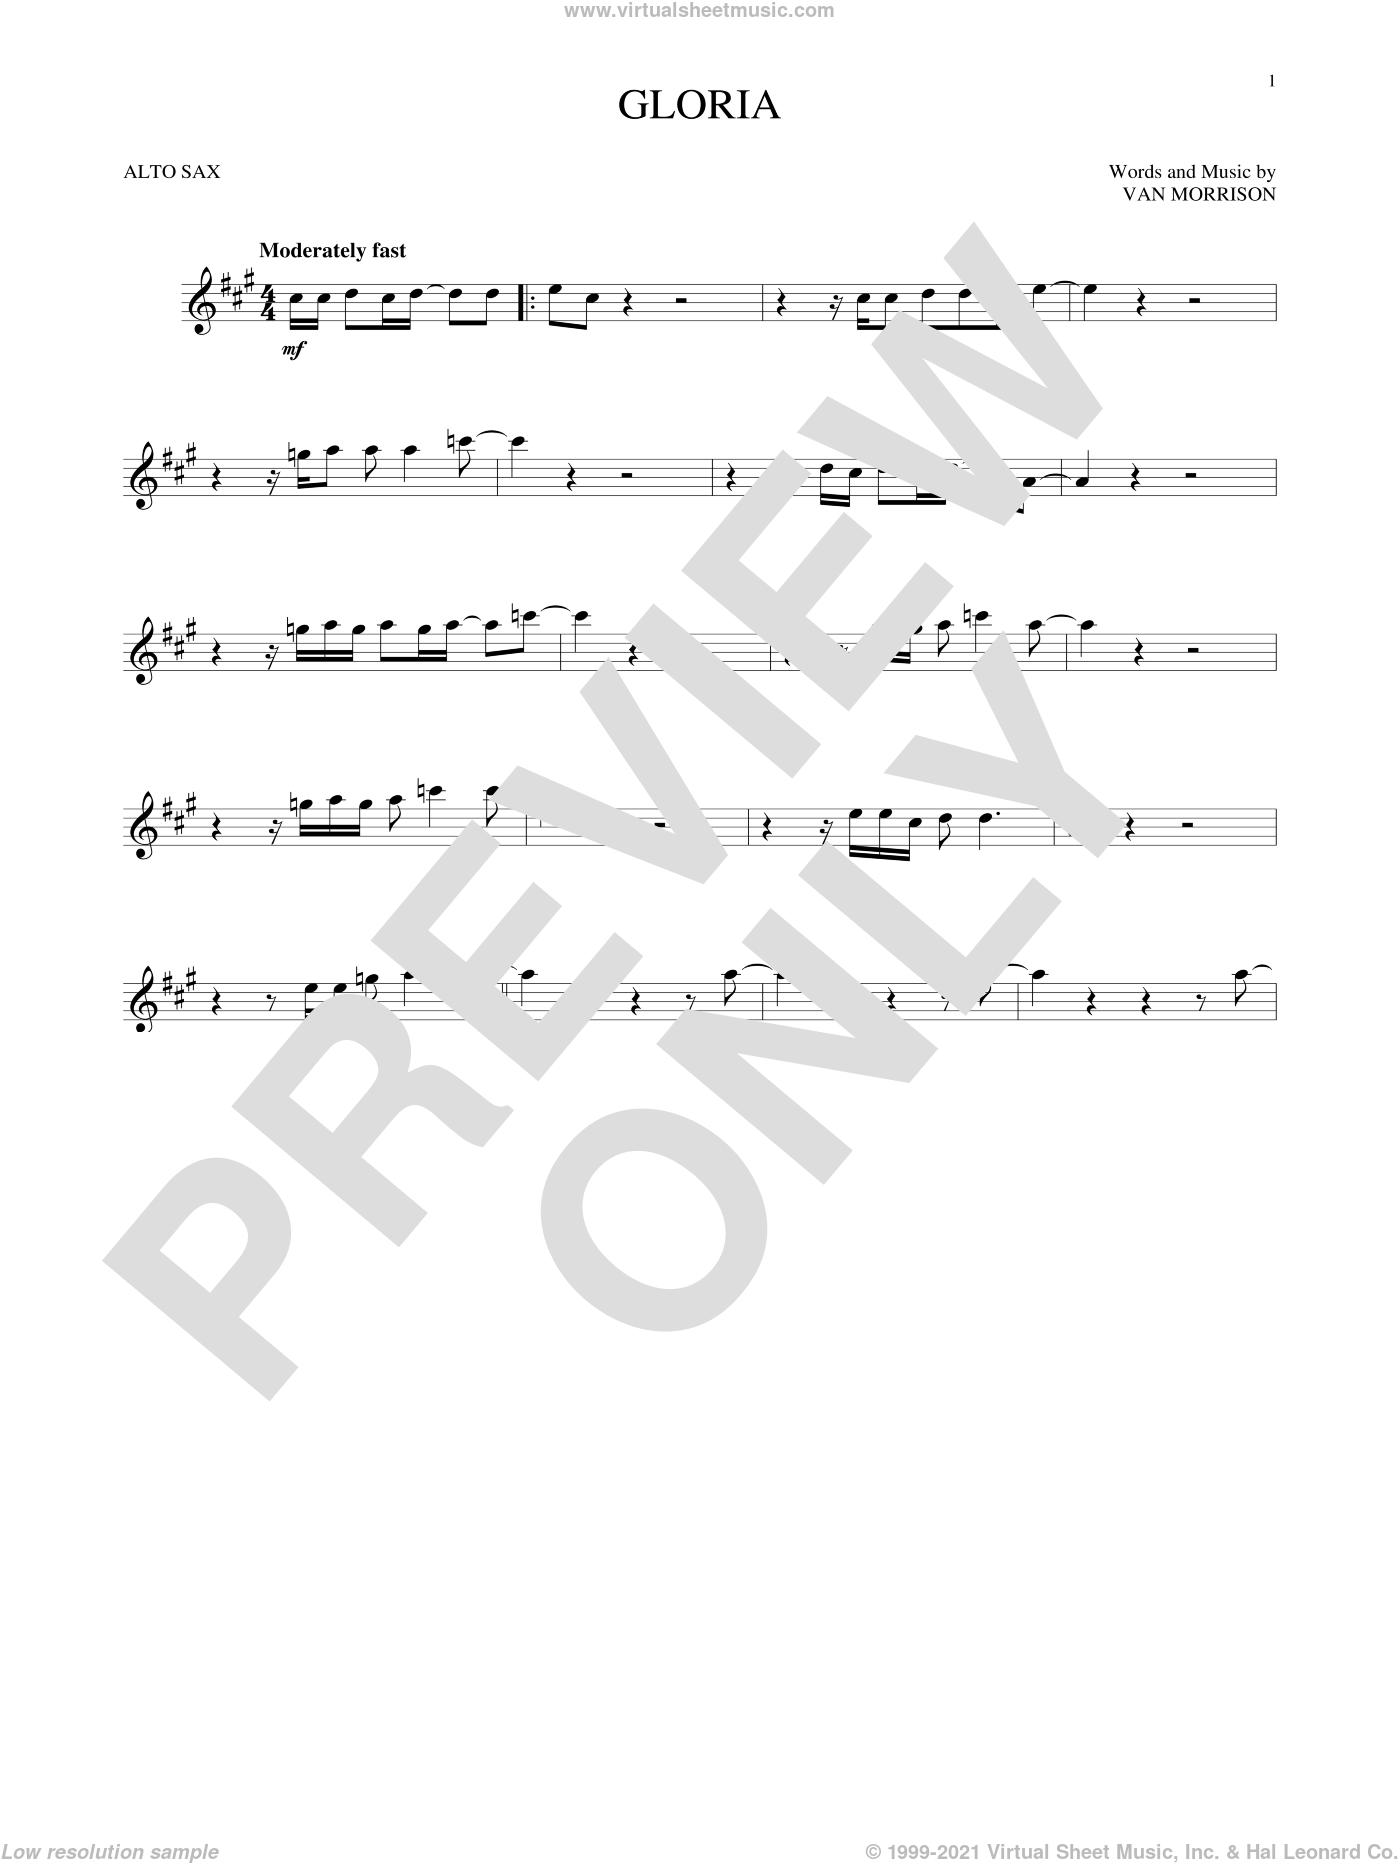 Gloria sheet music for alto saxophone solo by Van Morrison, intermediate skill level